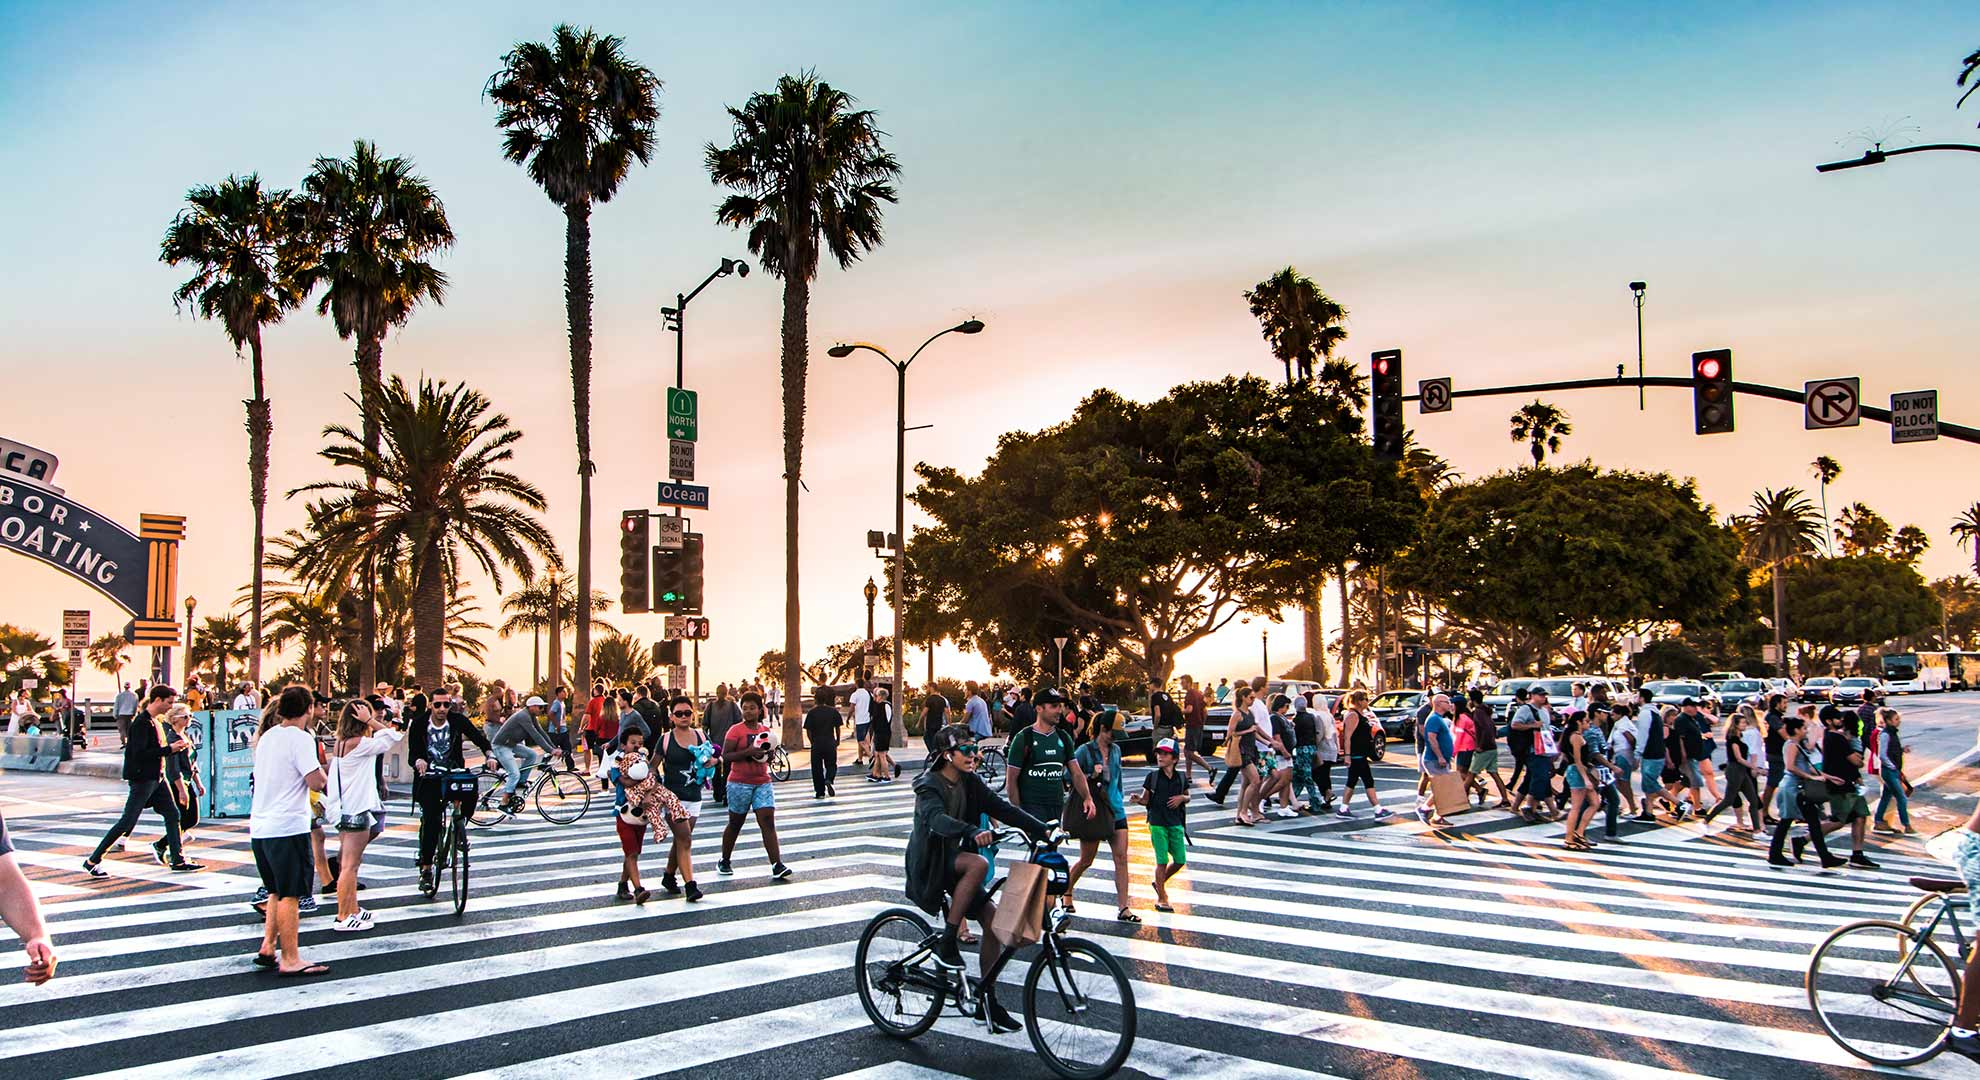 Crosswalk on Santa Monica boulevard